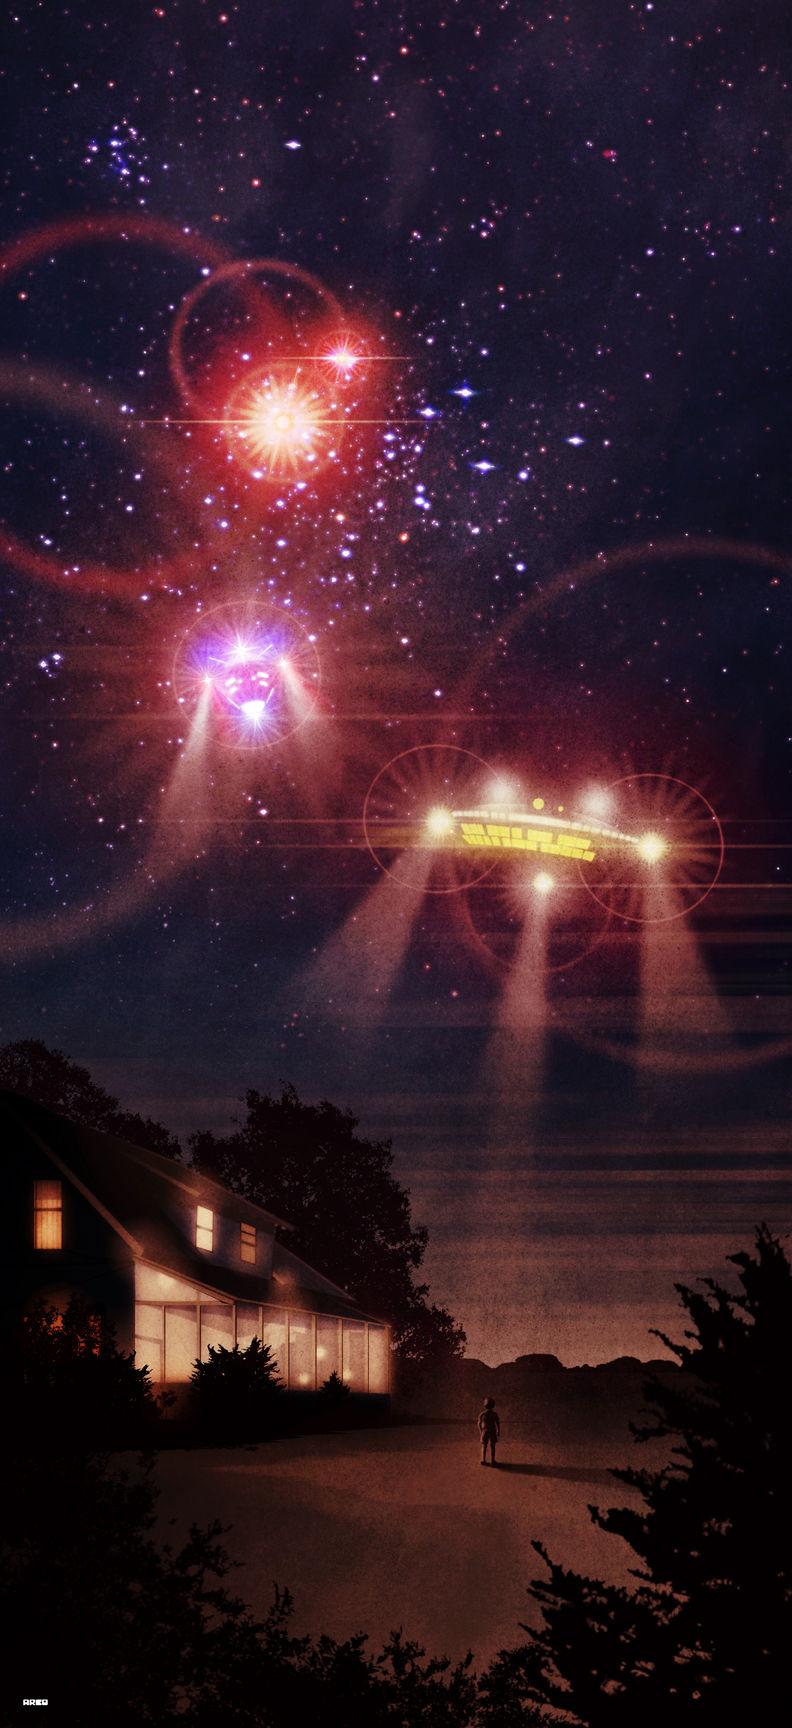 stunning-poster-art-for-iconic-movies-by-matt-fergusonMatt-Ferguson-Close-Encounters.jpg